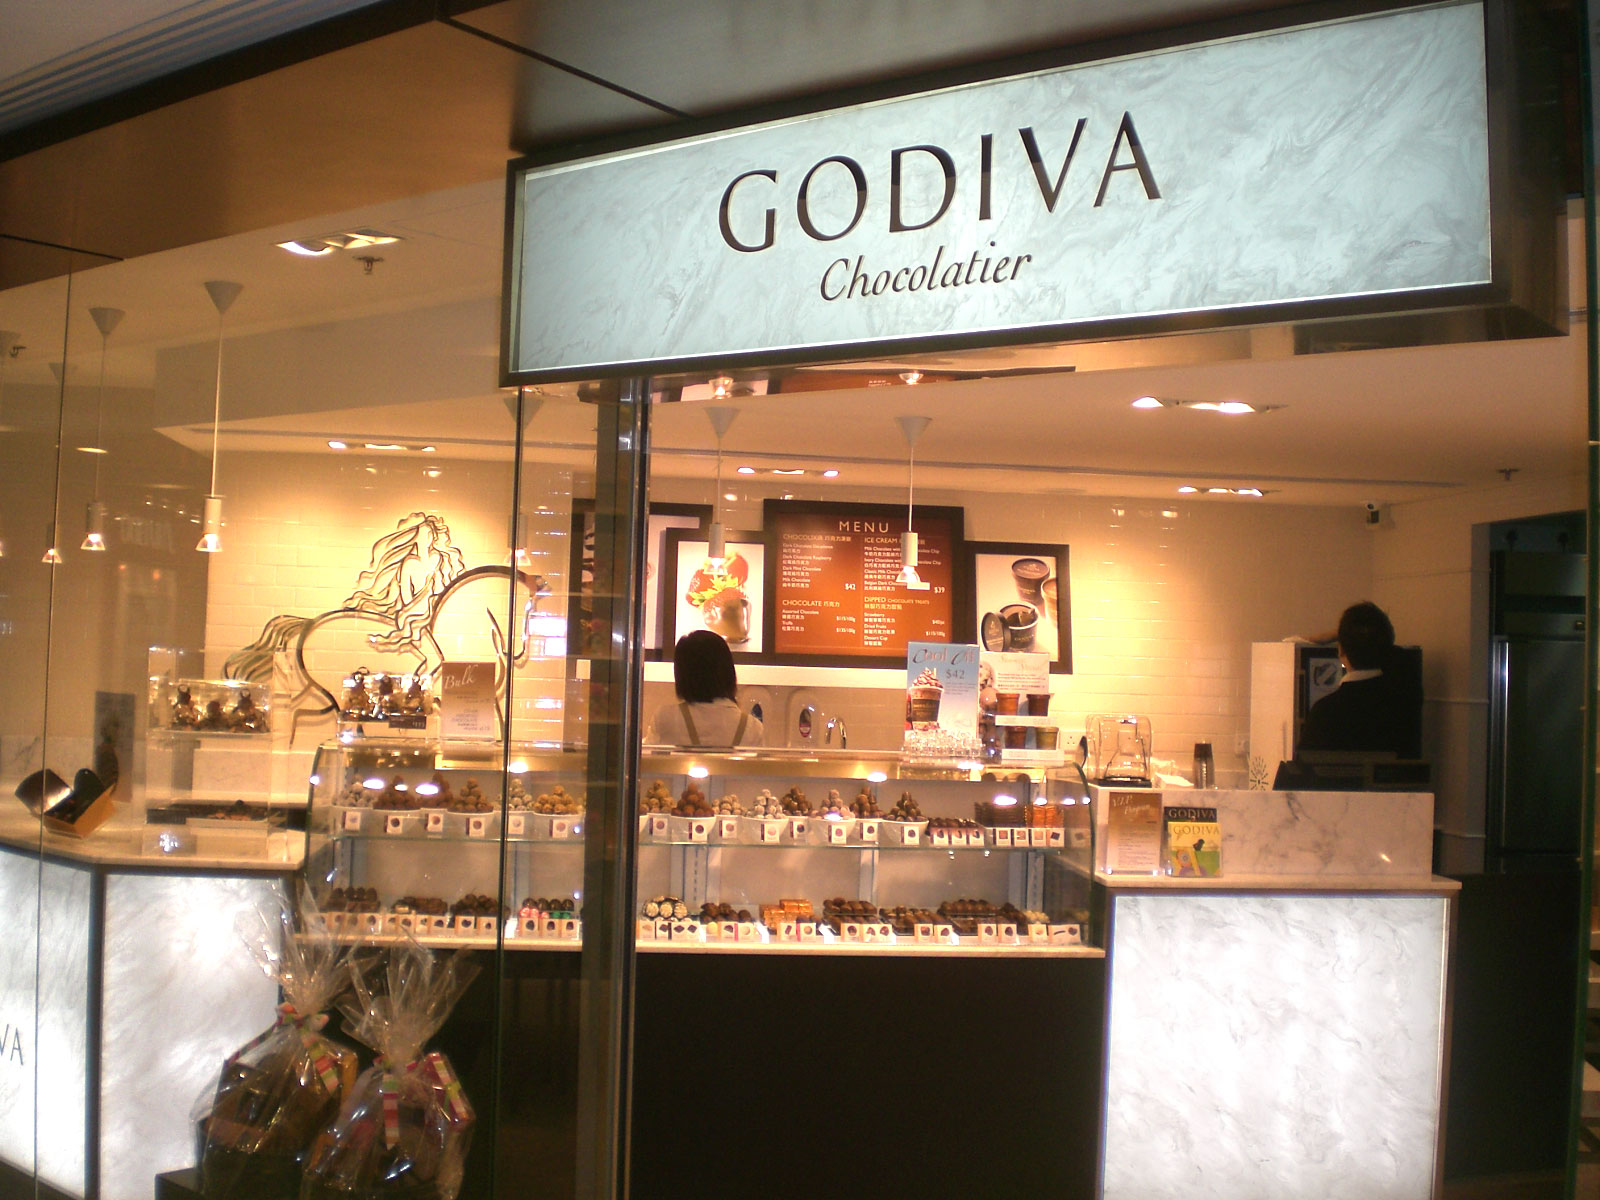 HK_Kln_Bay_Telford_Plaza_GODIVA_Chocolatier_a.jpg